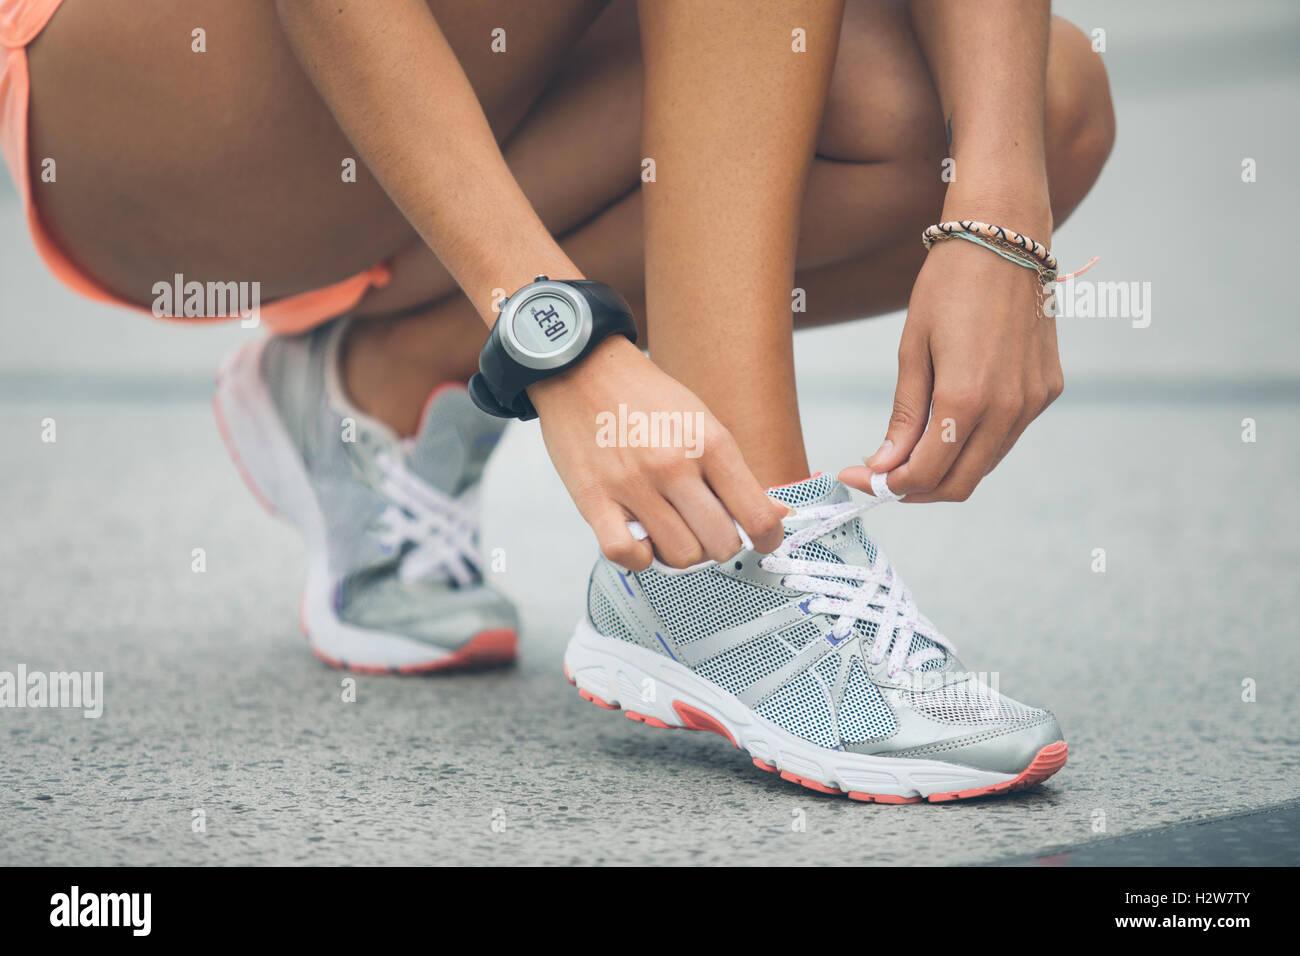 Mujer calzado deportivo atado Imagen De Stock